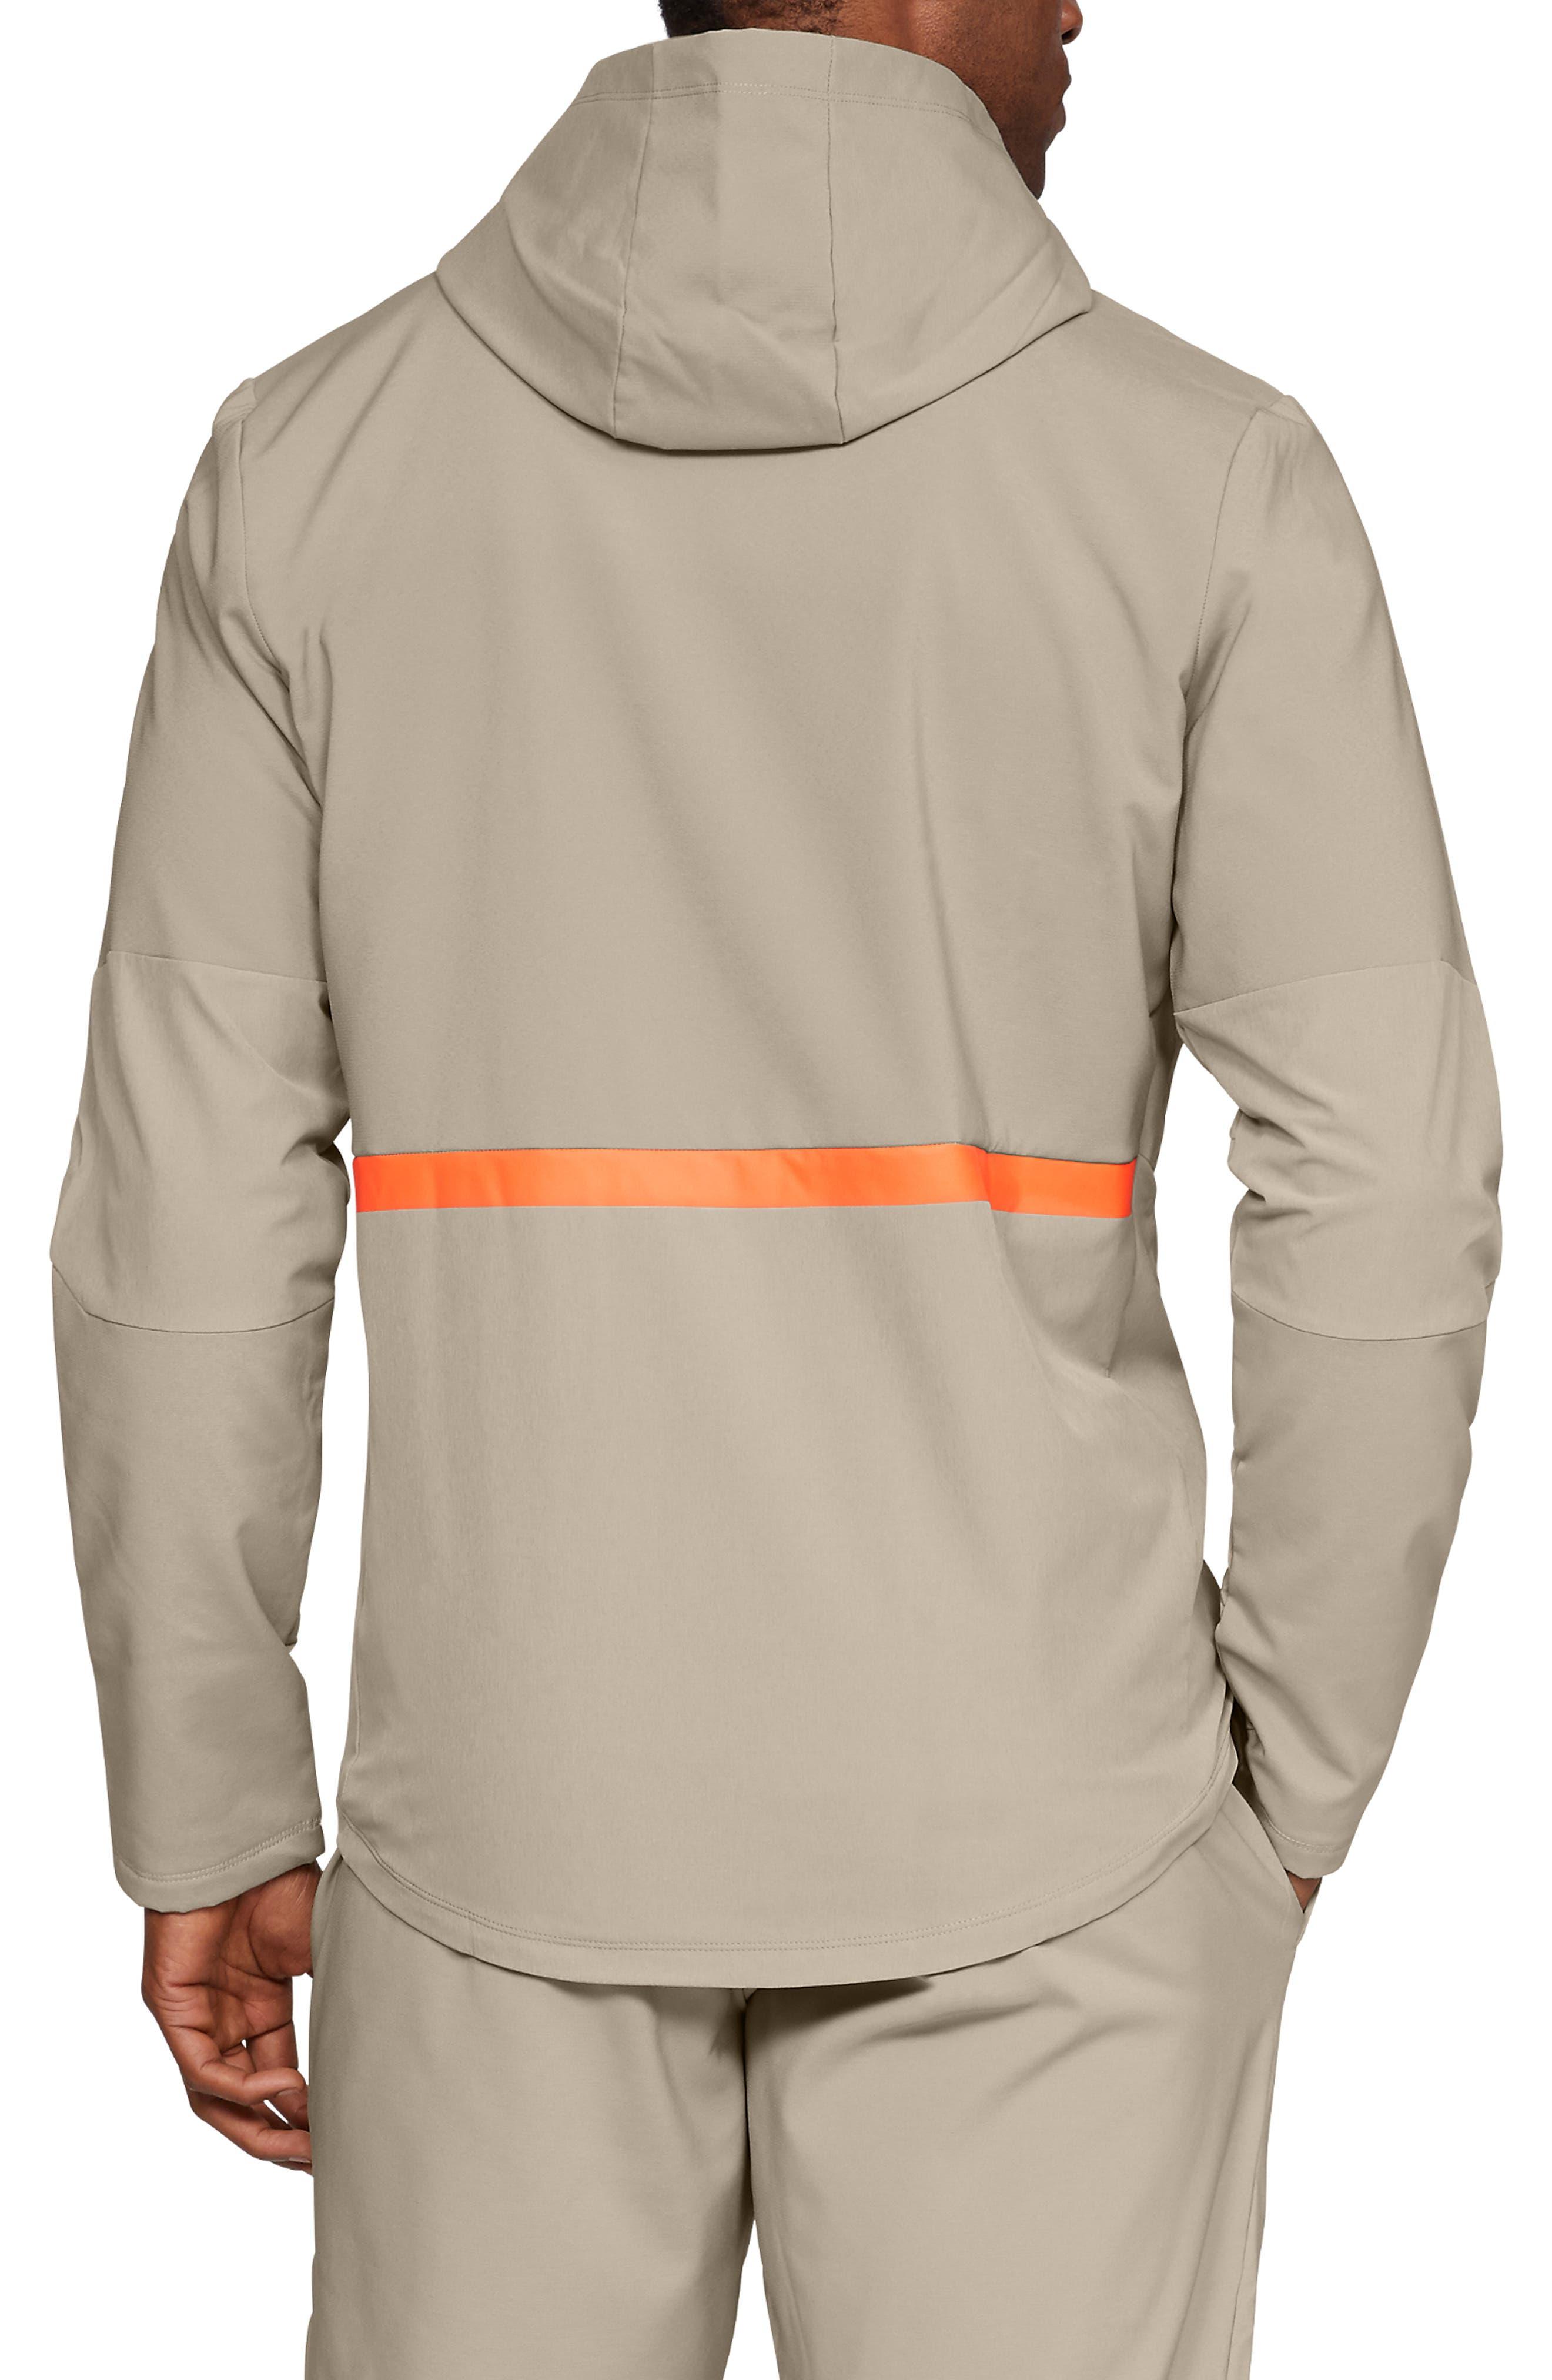 Storm Cyclone Water Repellent Hooded Jacket,                             Alternate thumbnail 2, color,                             CITY KHAKI/ BLACK